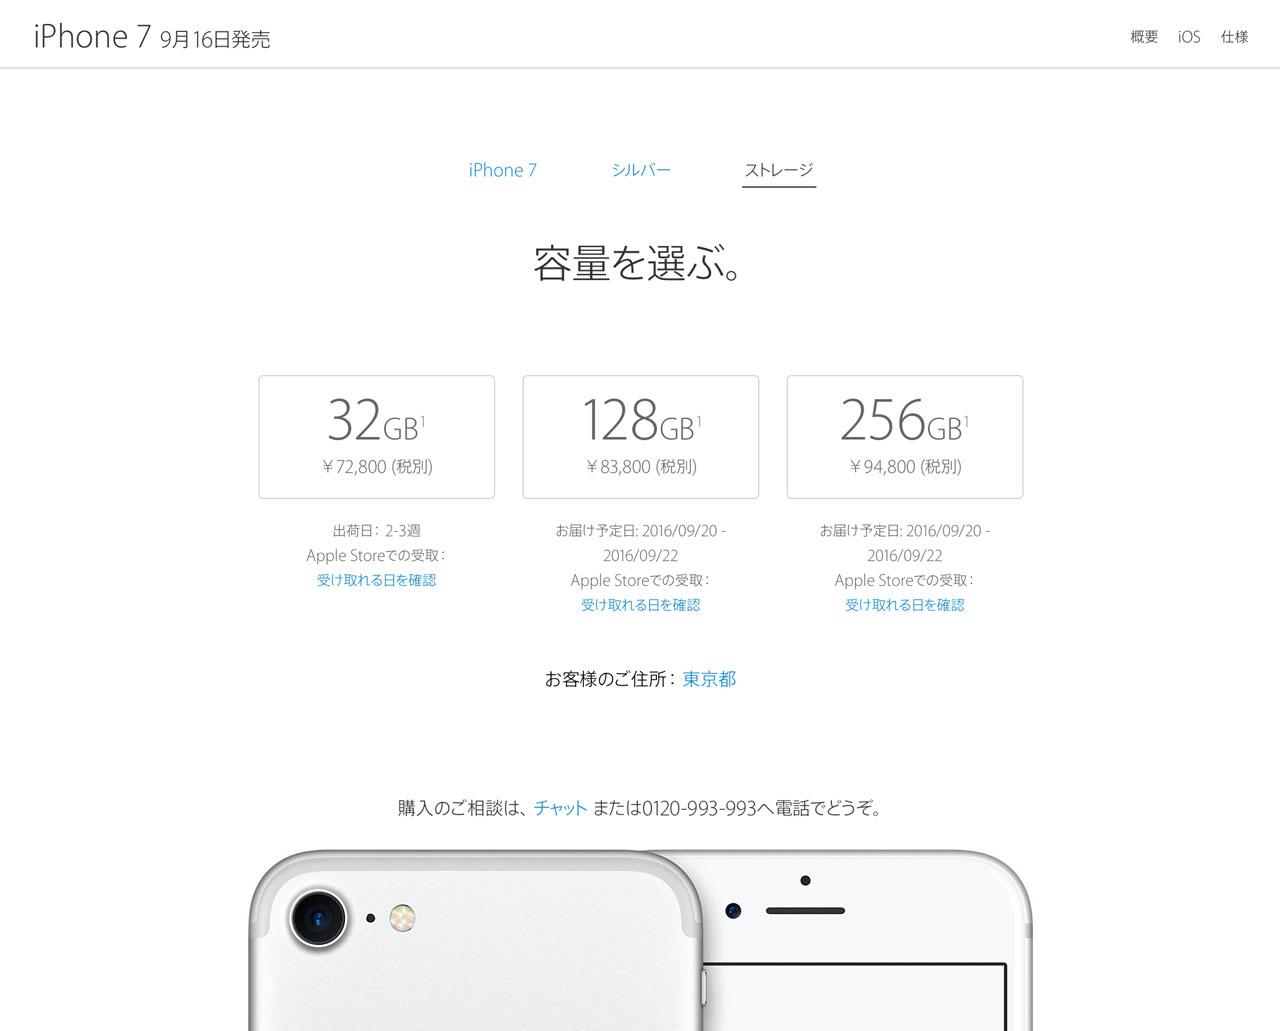 iphone-7-apple-store-japan-5